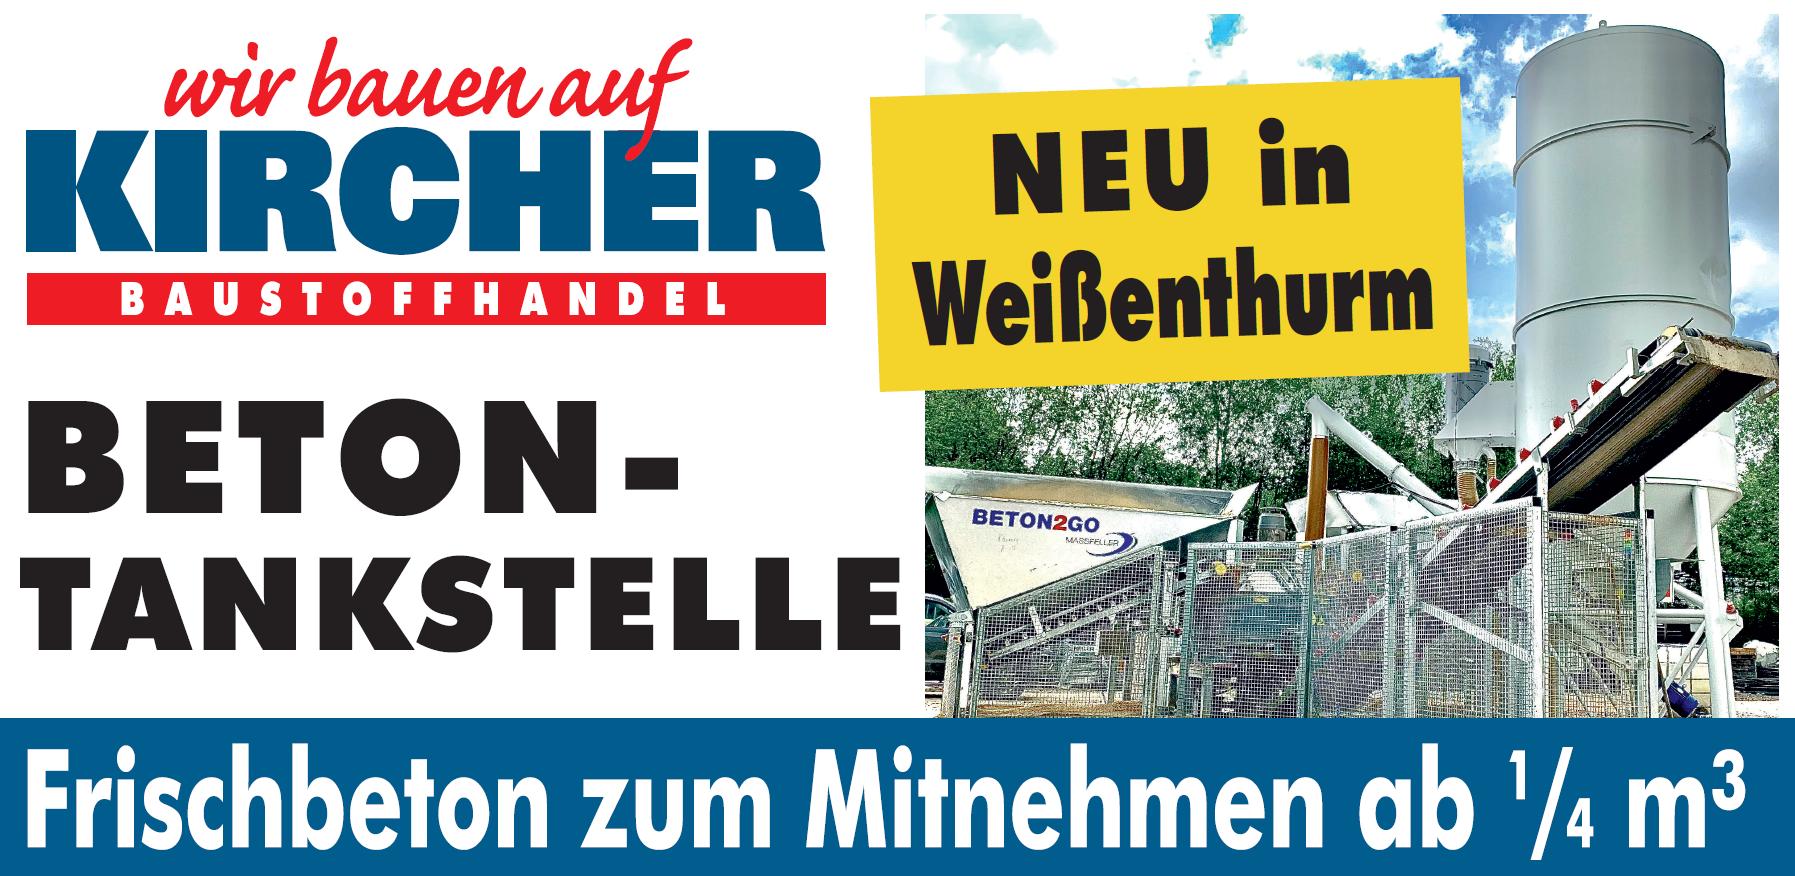 Neu: Betontankstelle in Weißenthurm